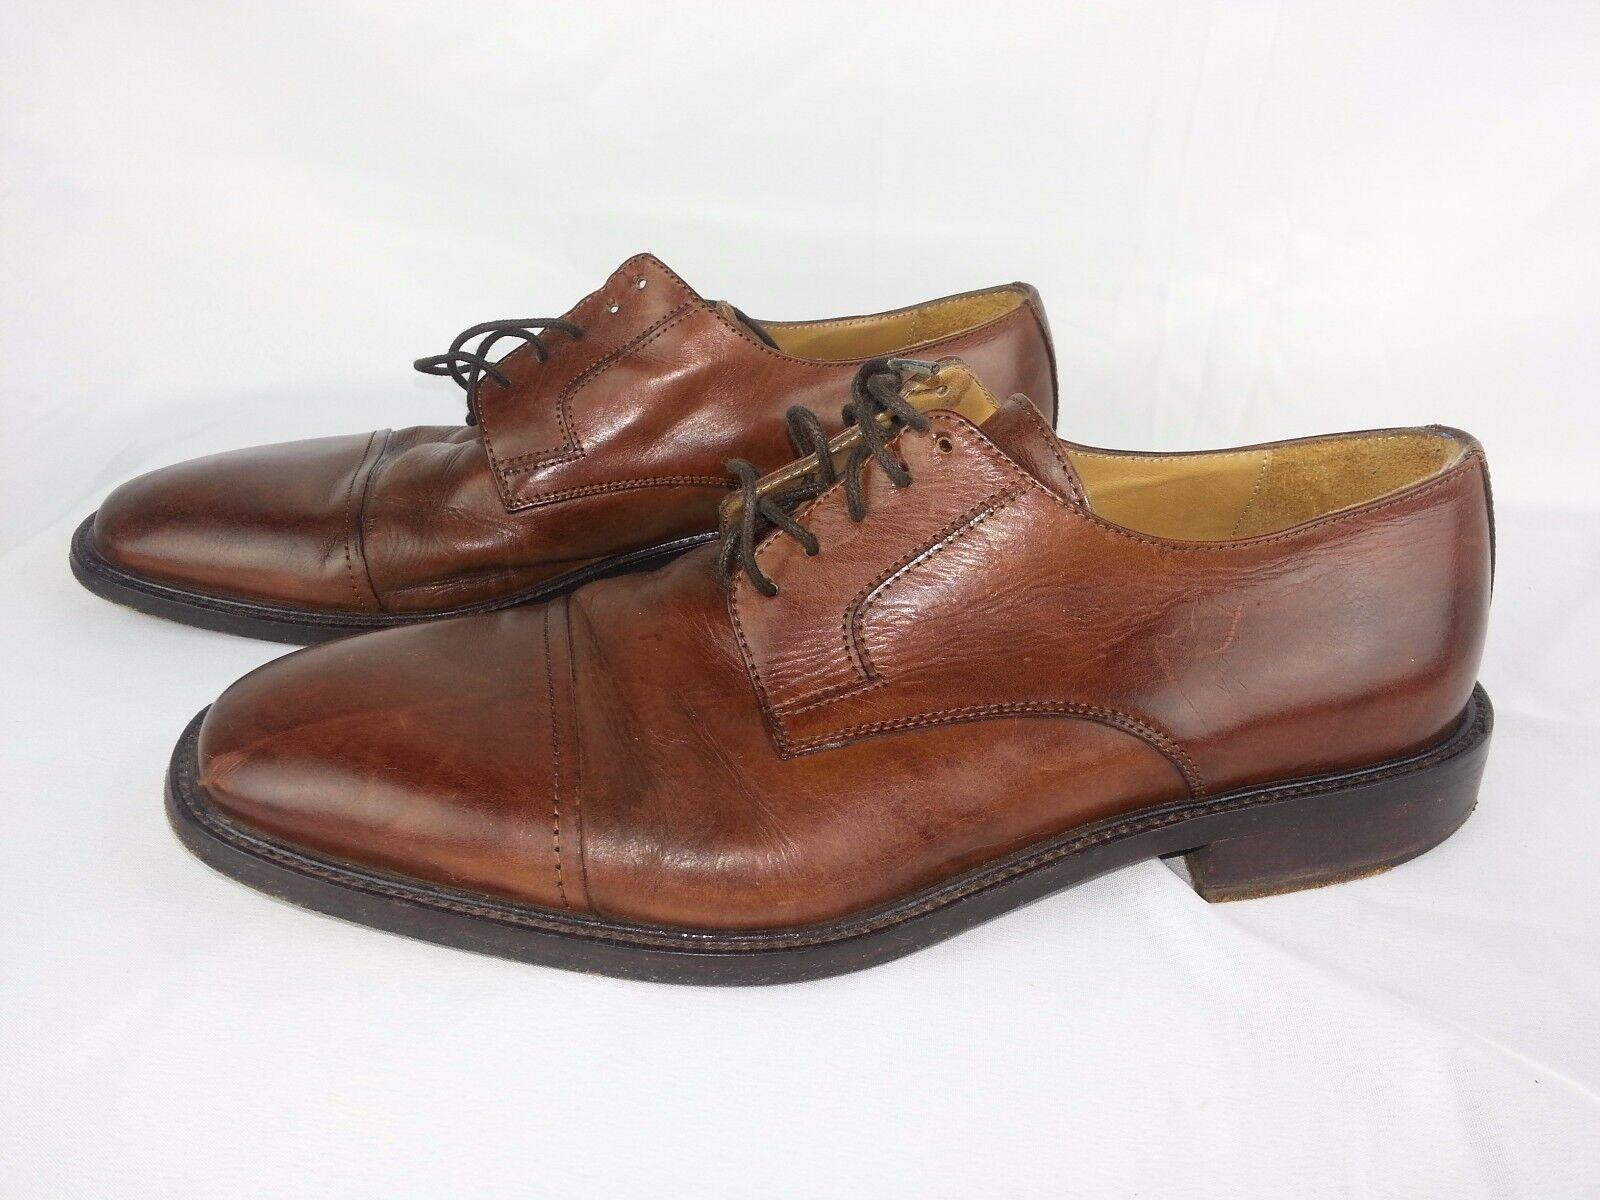 J Murphy Men's shoes Size 8.5 M Brown Leather Lace Up shoes Johnston Murphy